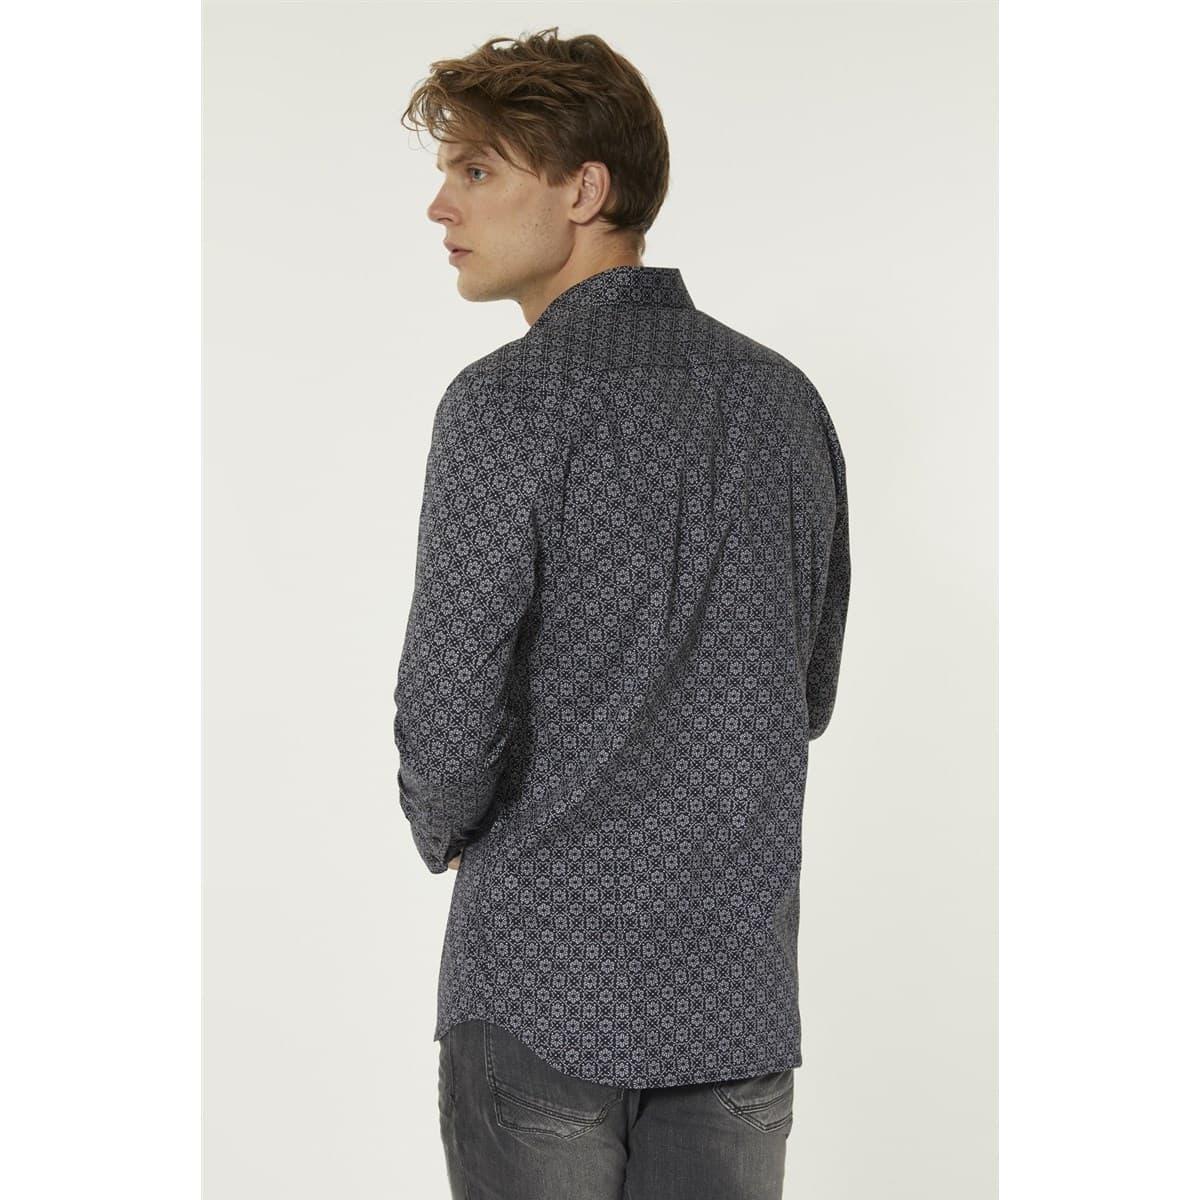 Baskılı Alttan Britli Yaka Slim Fit Erkek Gömlek (A92Y2080-03)